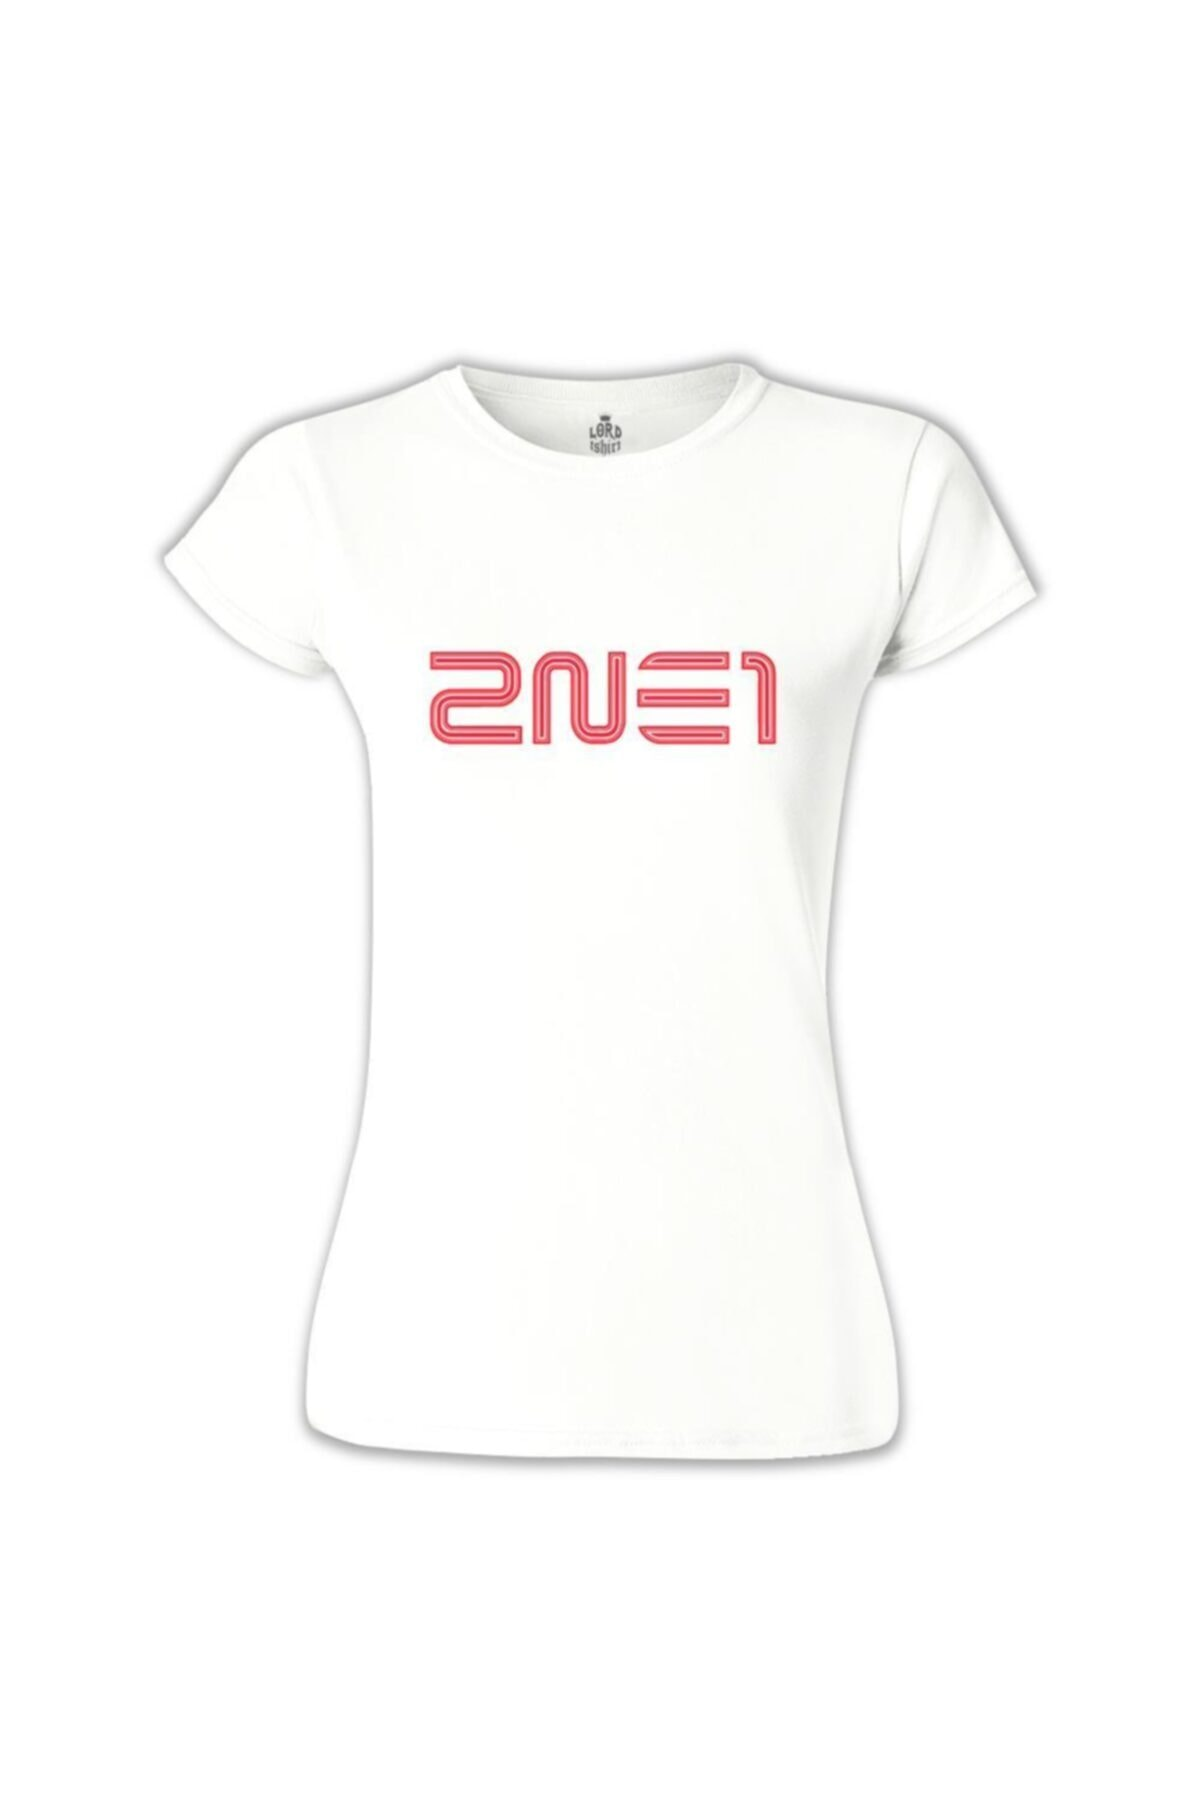 Lord T-Shirt Kadın Beyaz 2ne1 Logo shirt